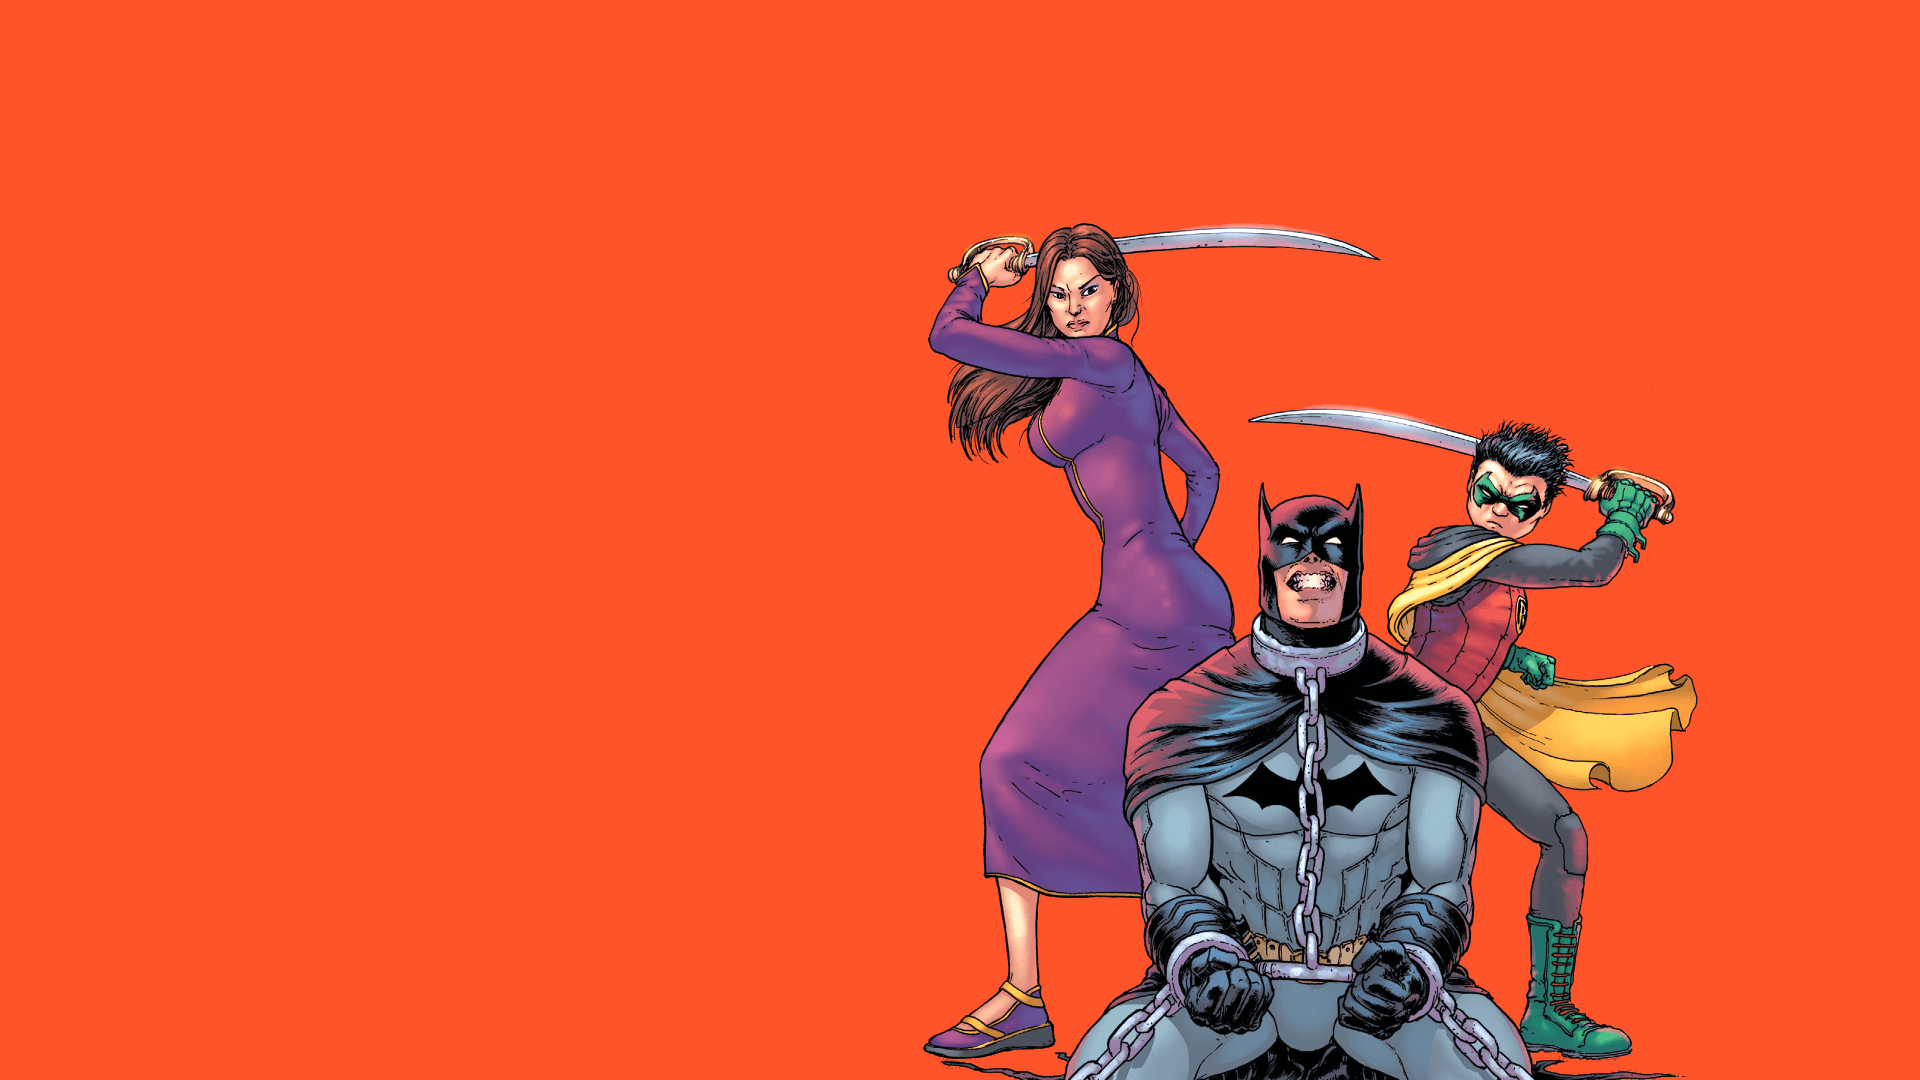 batman robin wallpaper 1433x897 - photo #2